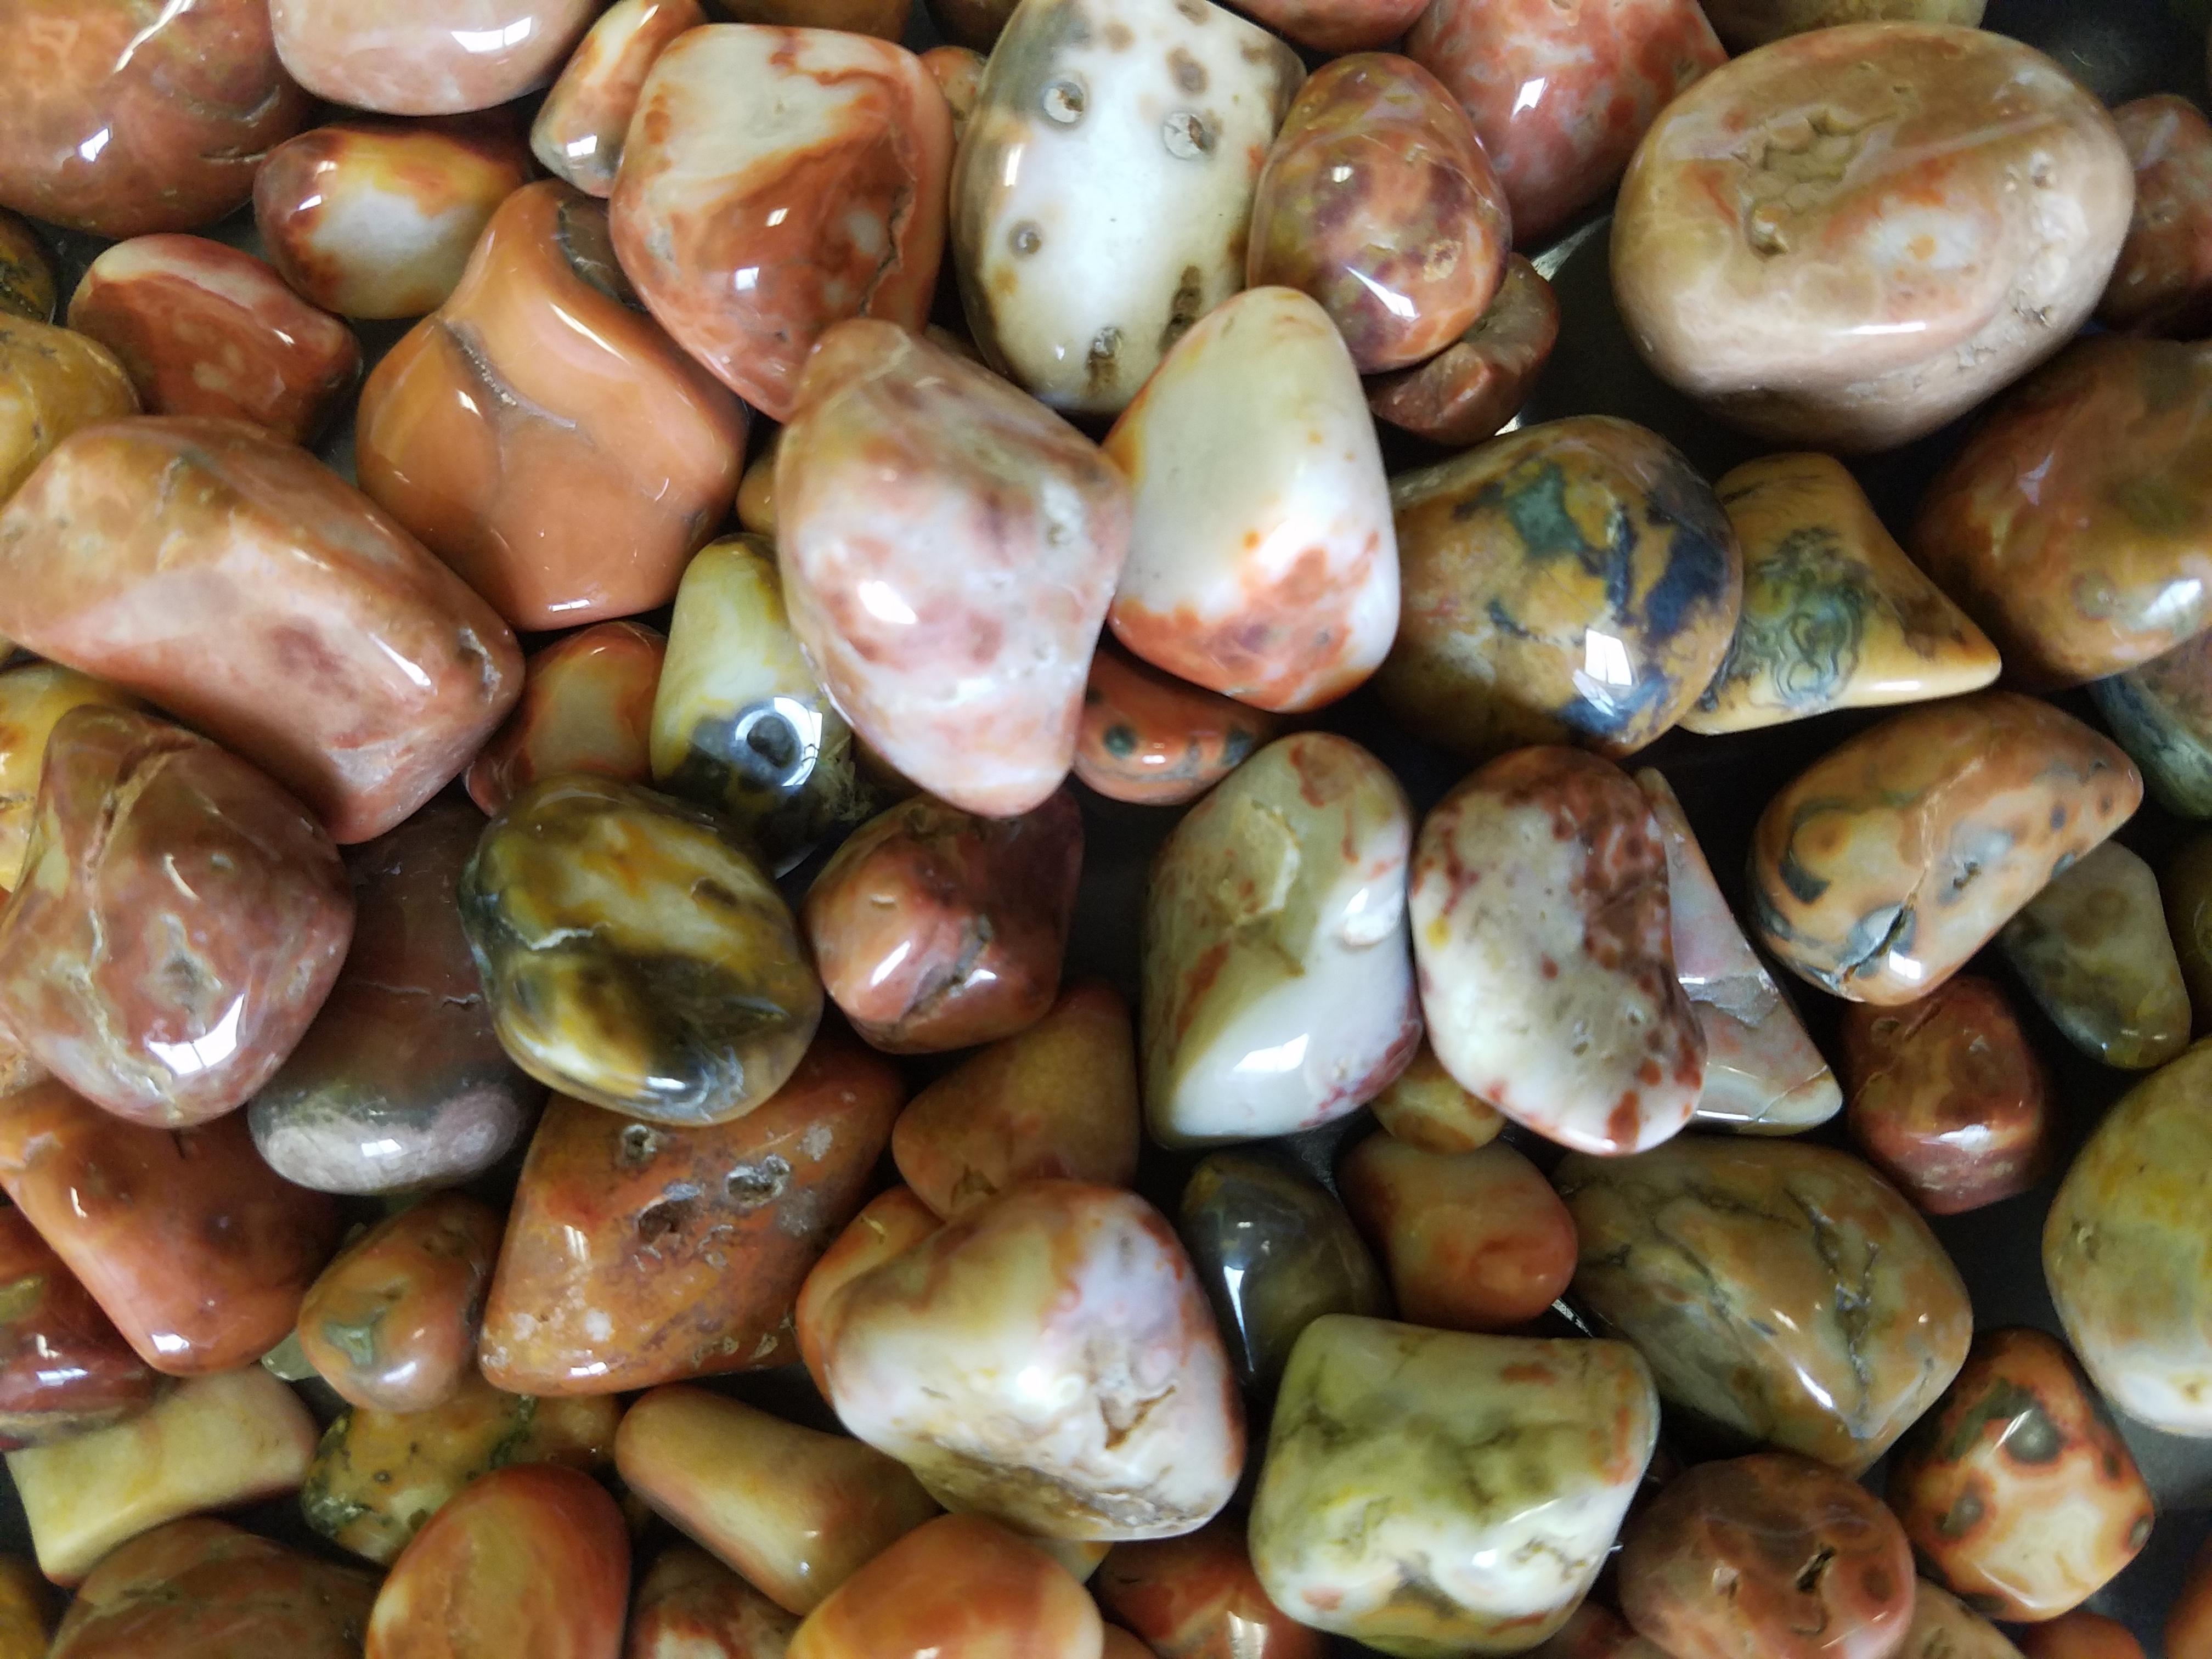 shiny-stones-4182.jpg